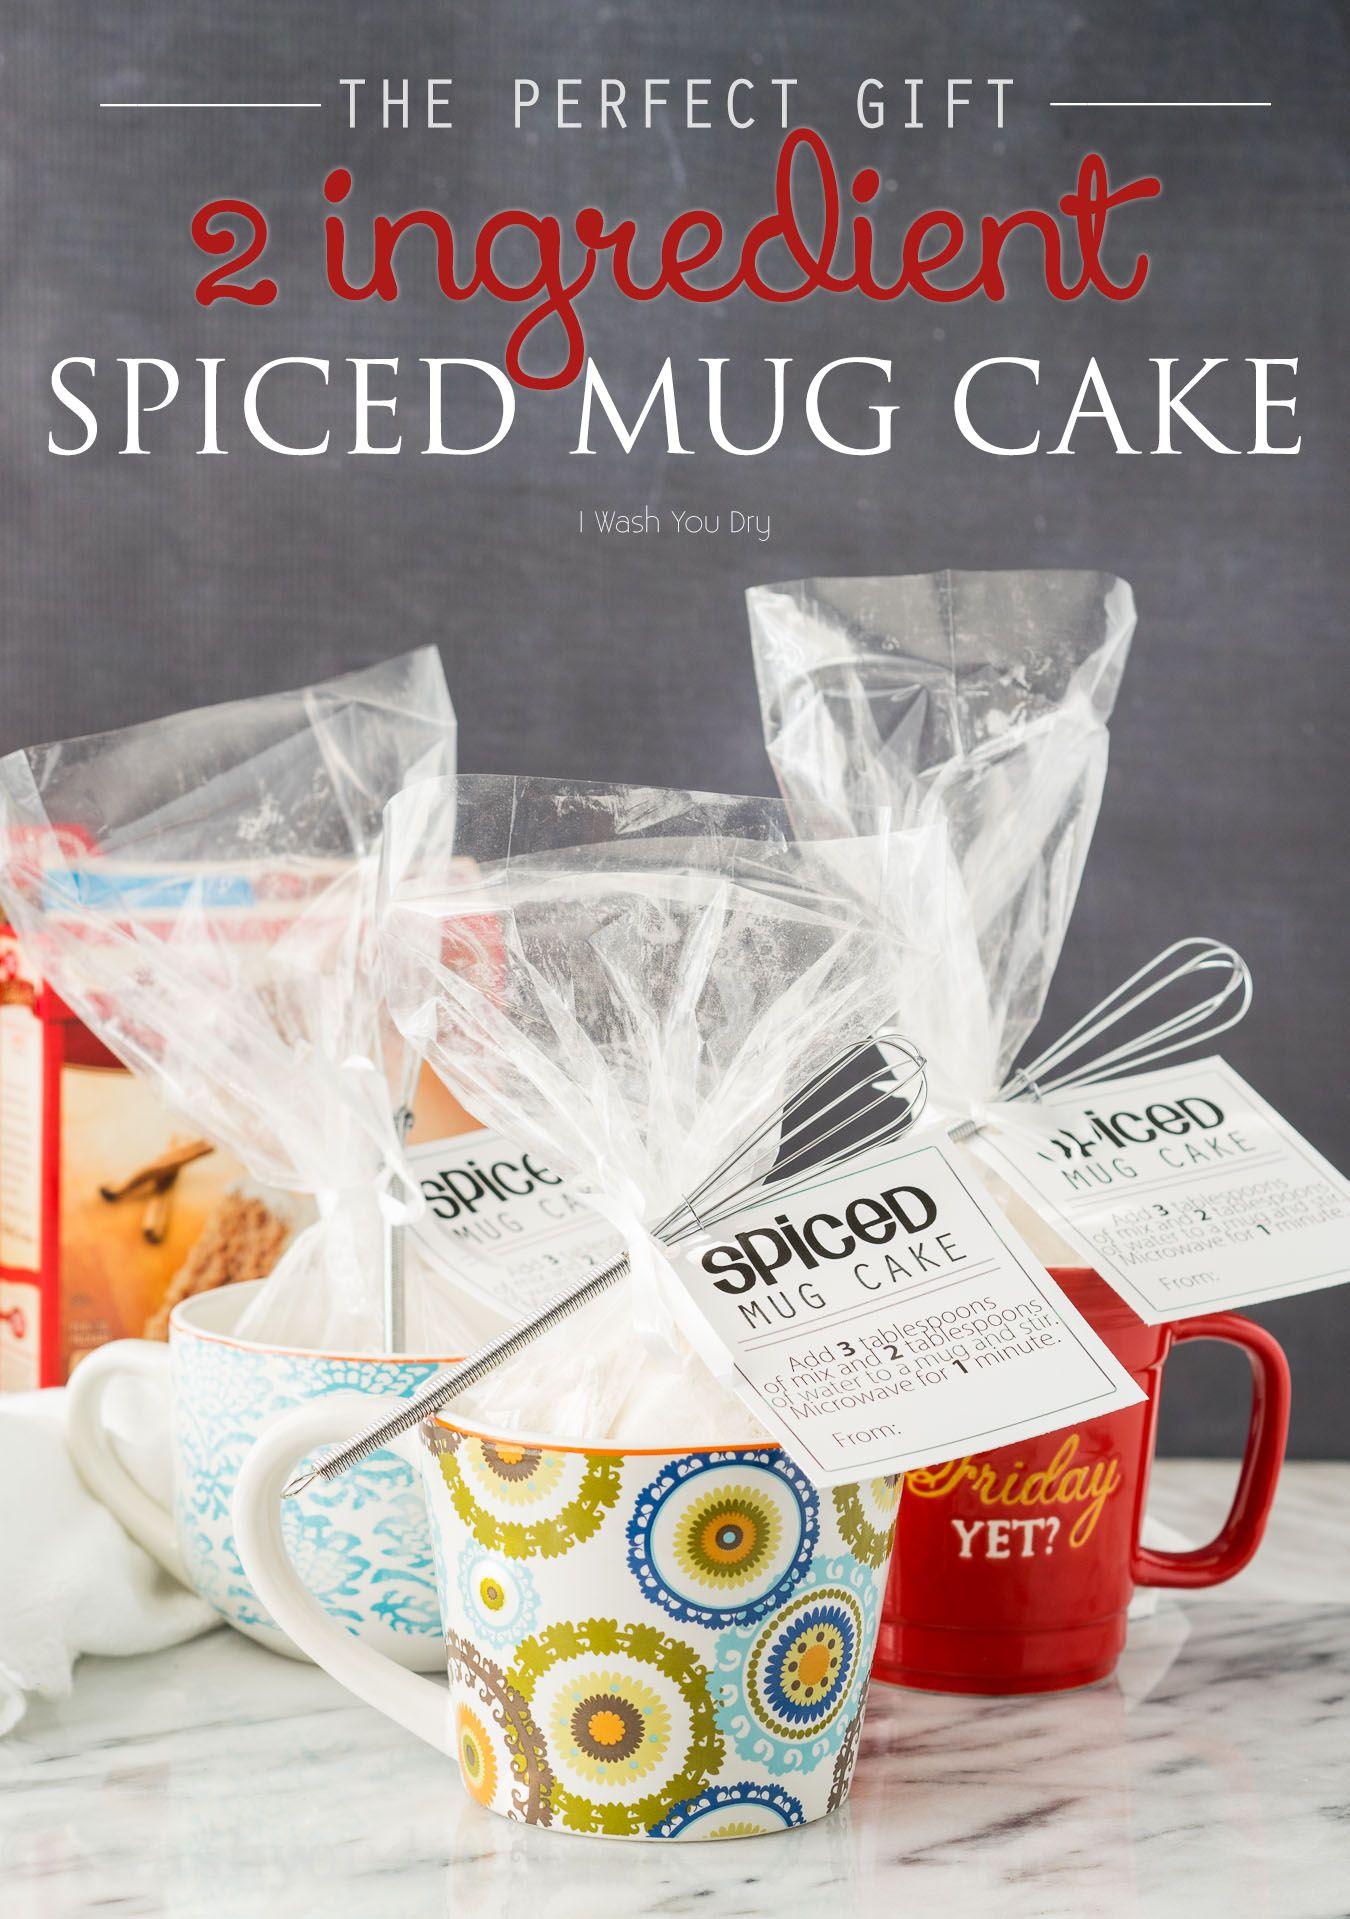 2 Ingredient Spiced Mug Cake | Recipe | Mug recipes, Gift ...